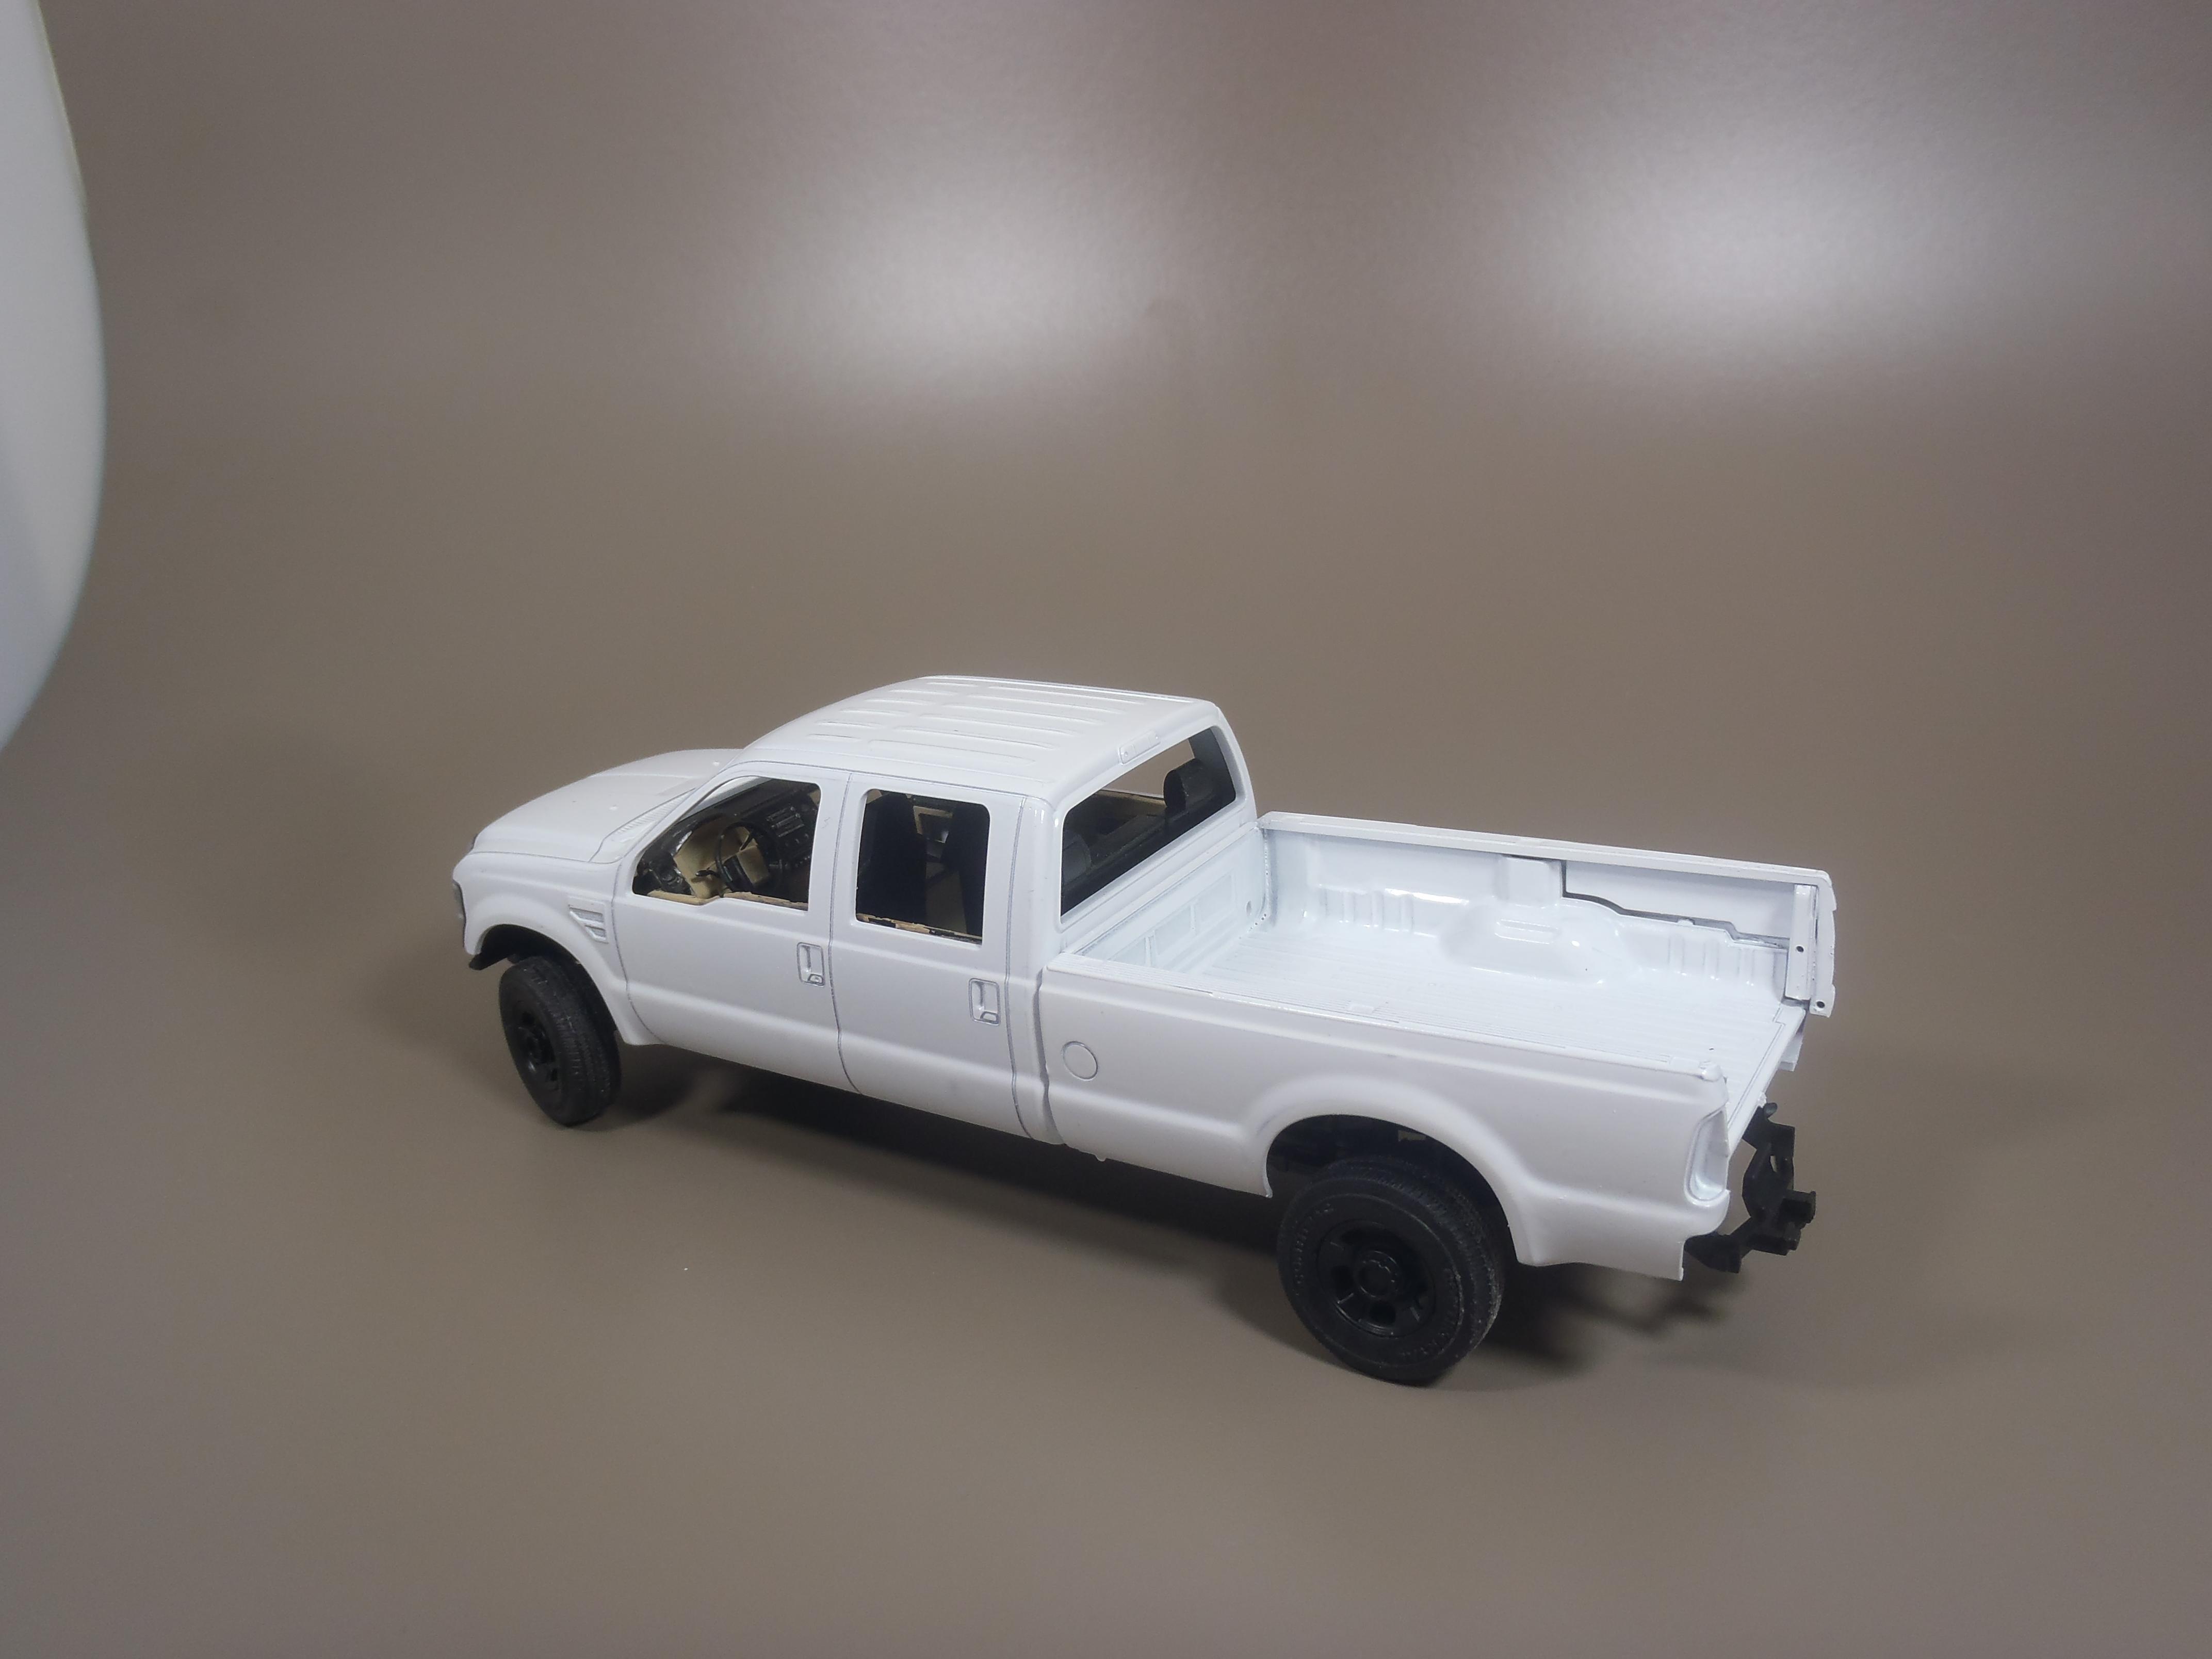 Pickup F 350 (Meng) au 1/35 - Page 2 16111509534315742614639659